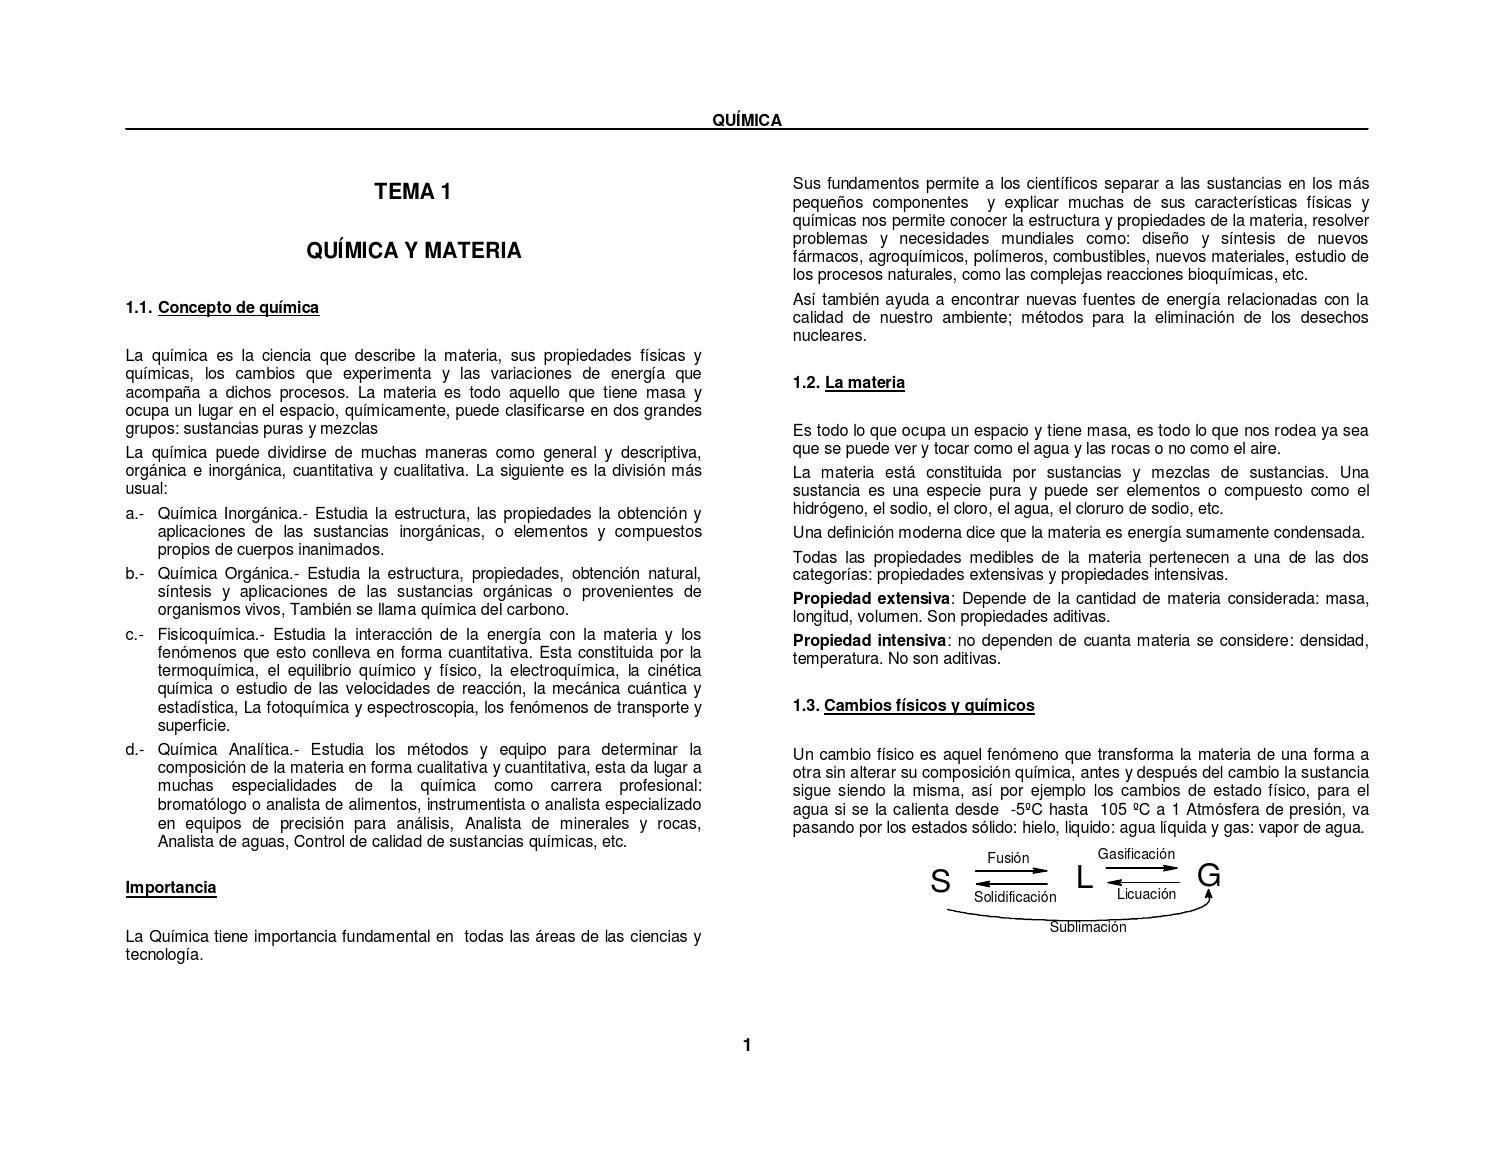 Solucionario de quimica excelente by Arnoldo Romero - issuu